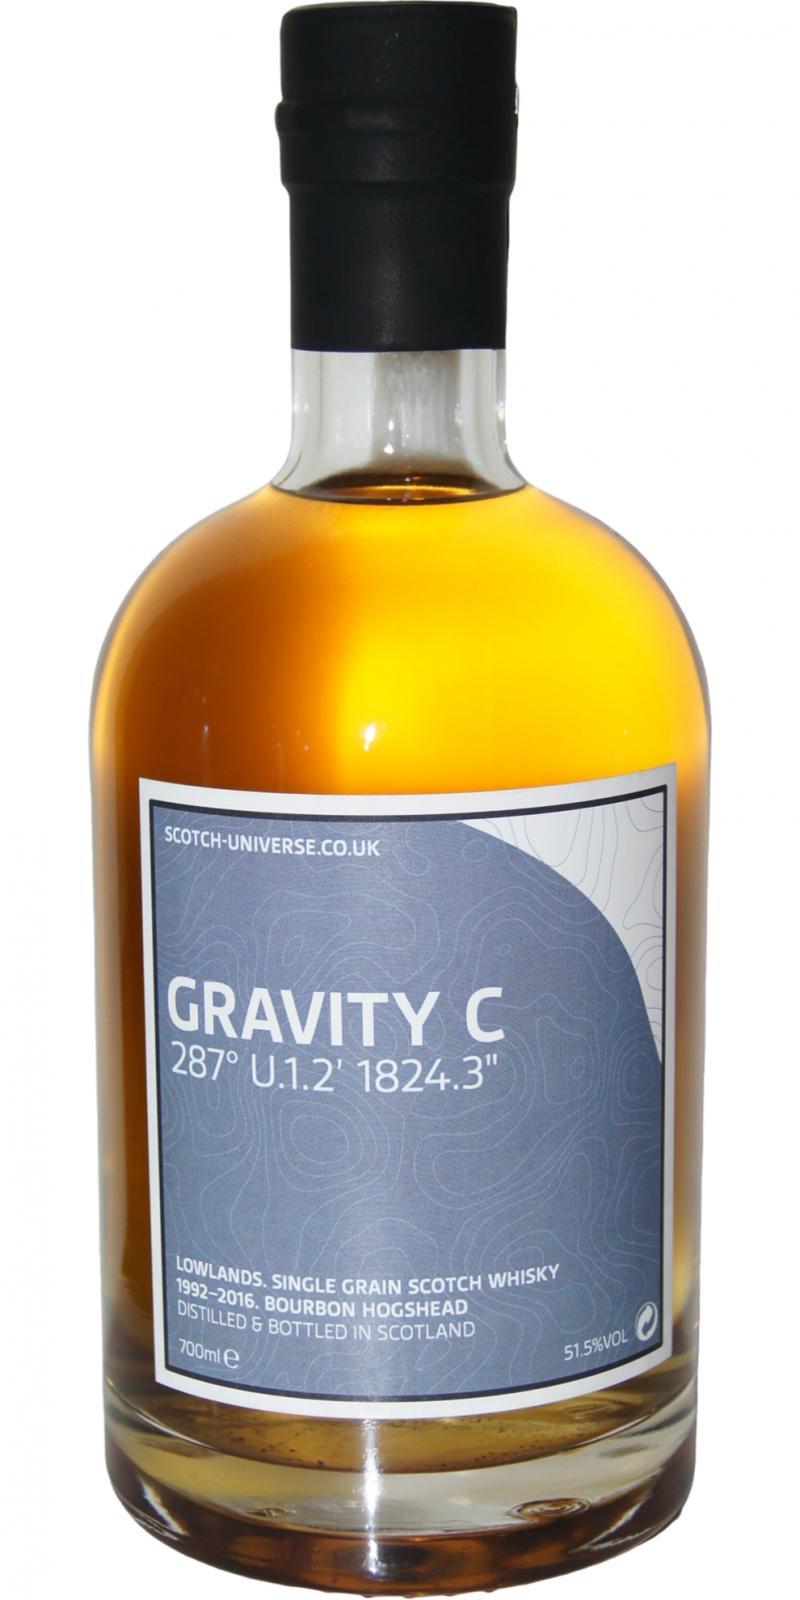 "Scotch Universe Gravity C - 287° U.1.2' 1824.3"""